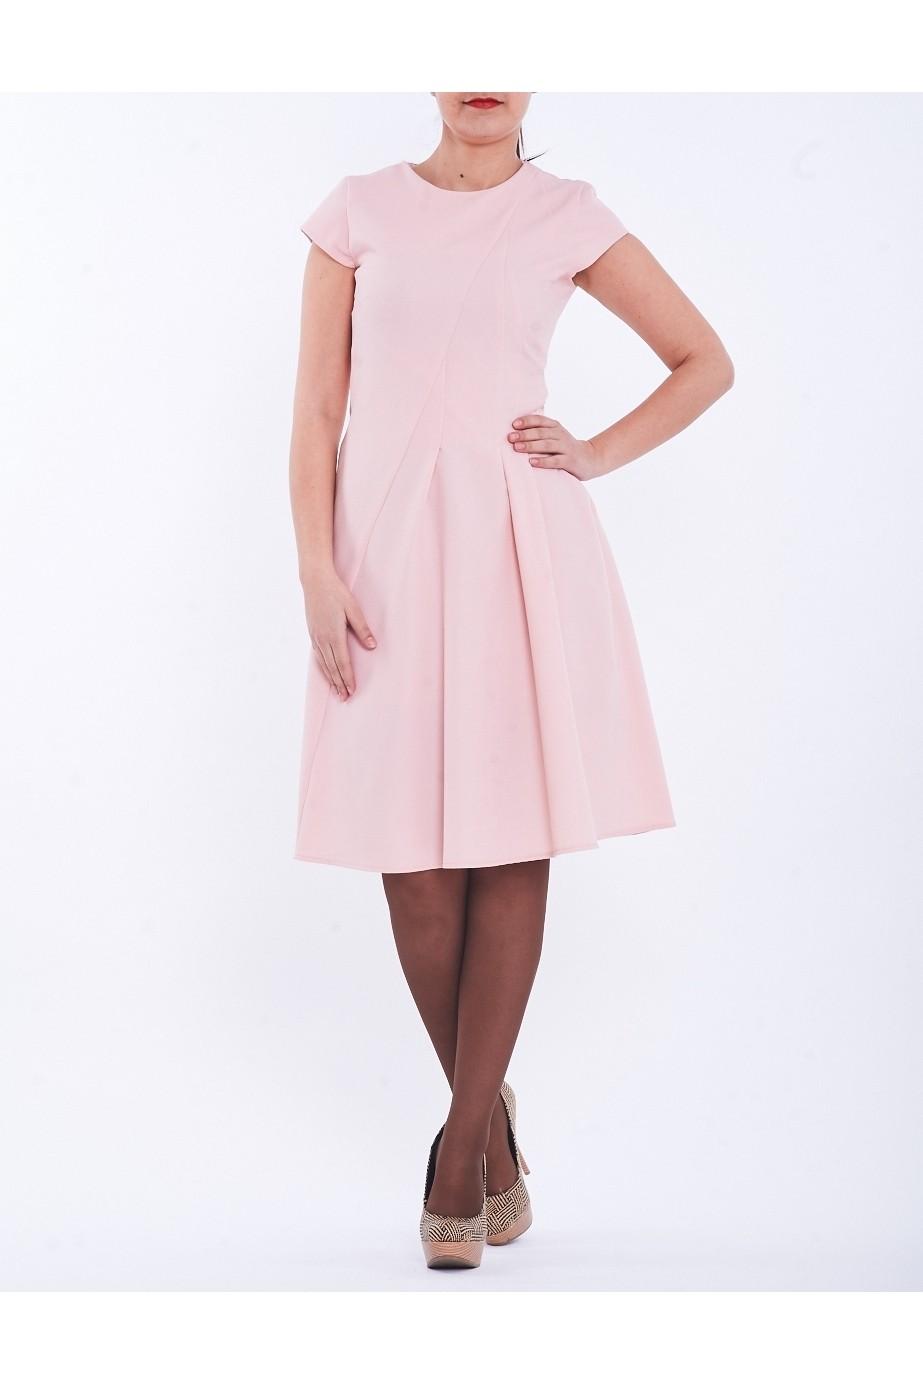 Rochie roz pal cu pliuri pe partea stanga TinaR 42